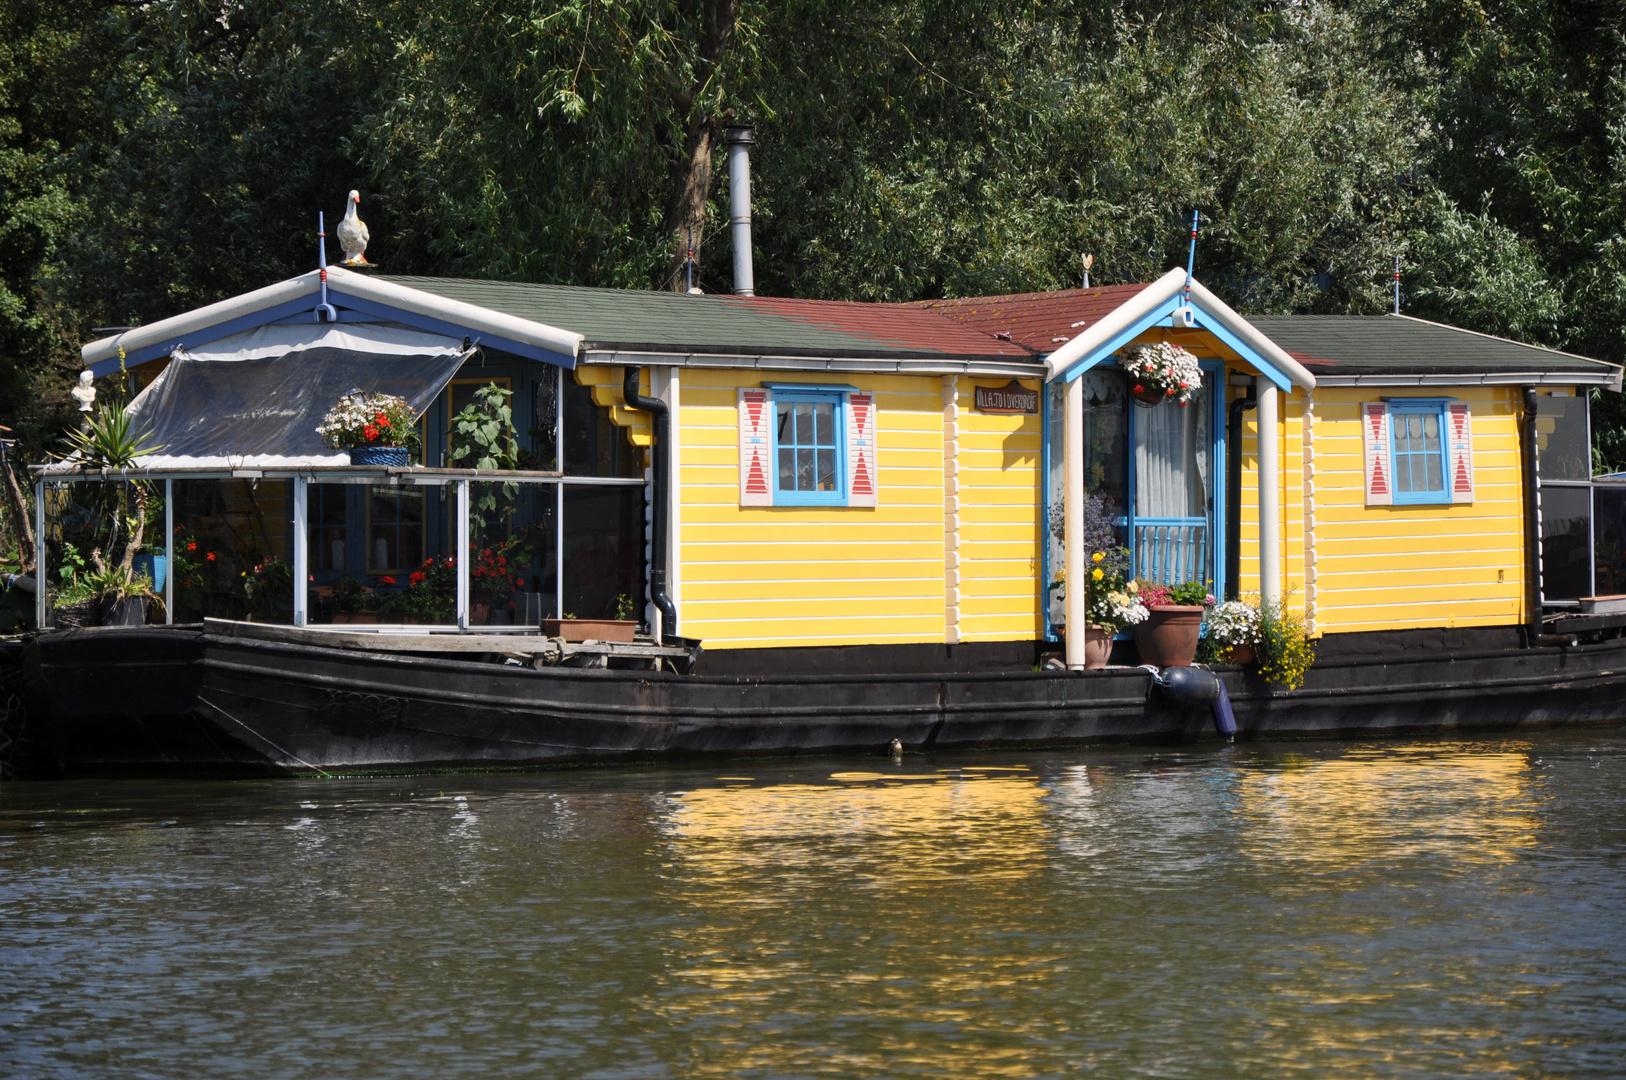 hausboot alkmaar foto bild europe benelux netherlands bilder auf fotocommunity. Black Bedroom Furniture Sets. Home Design Ideas